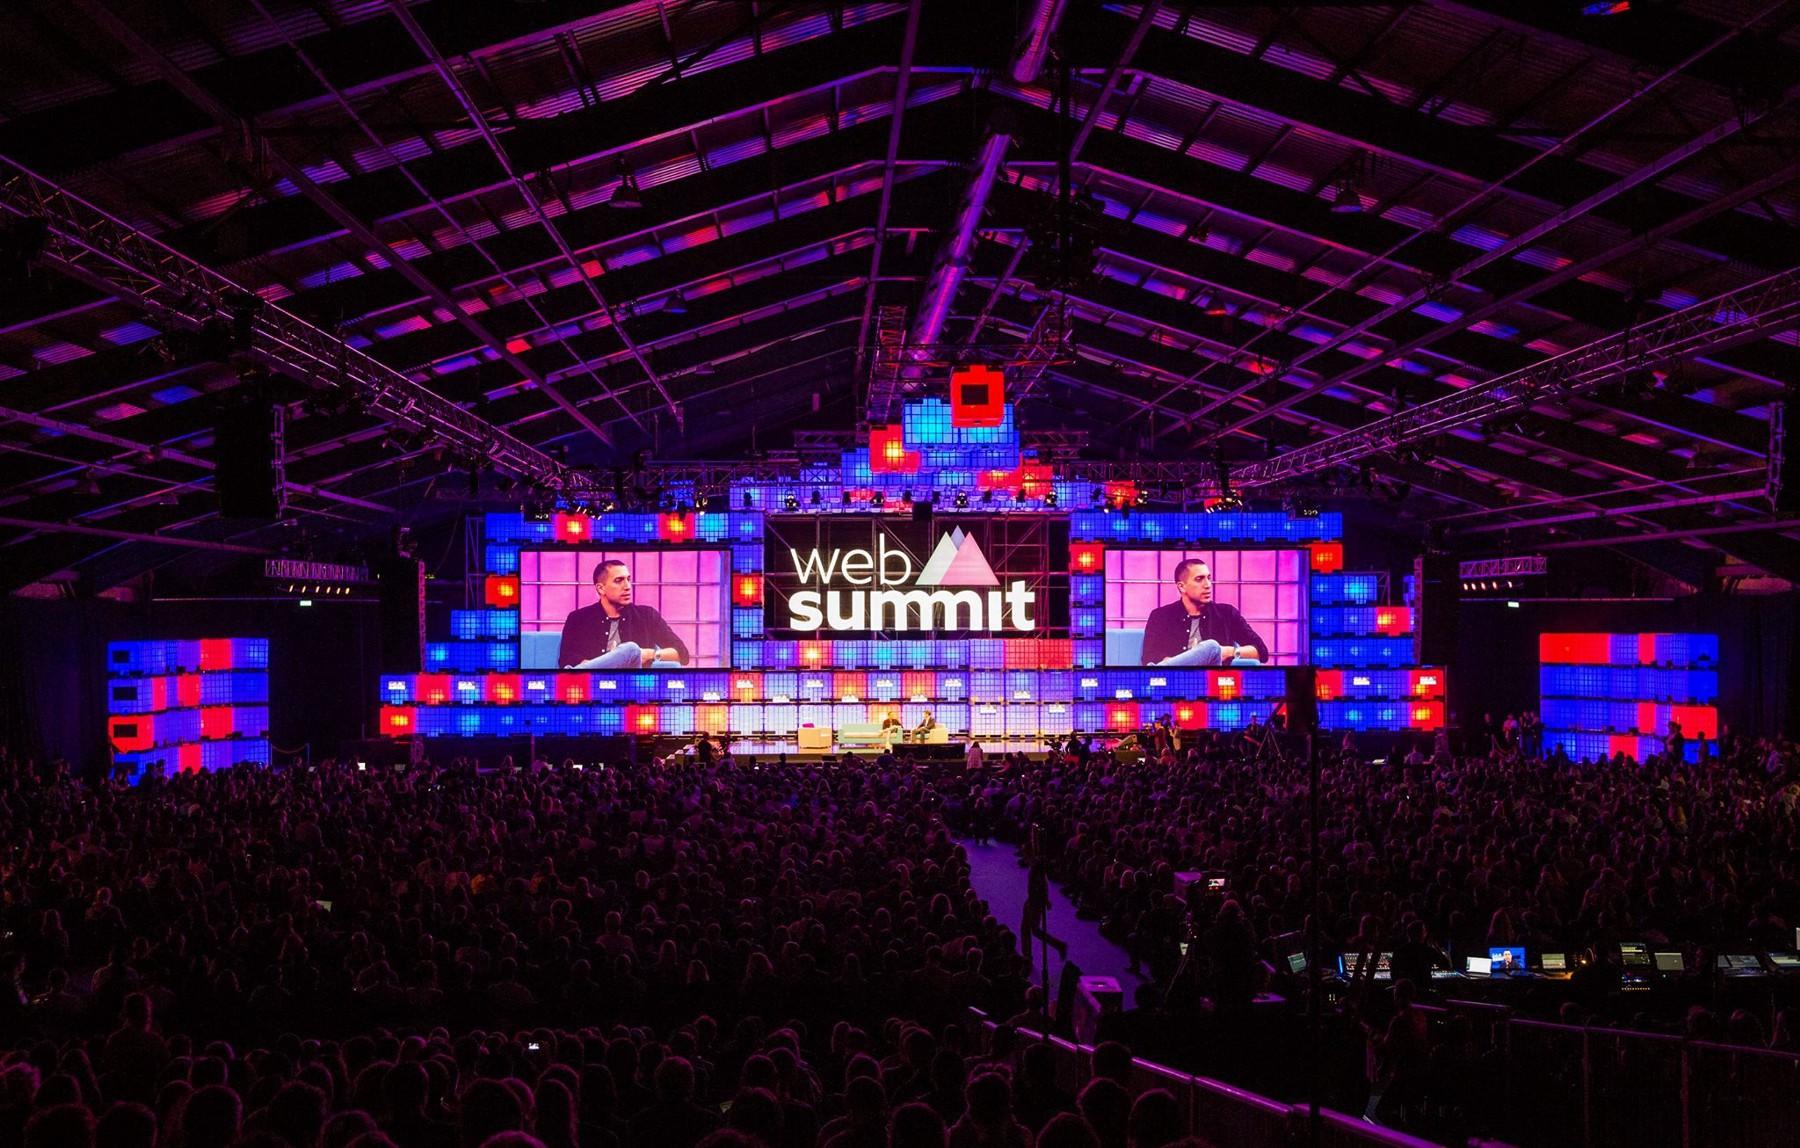 Web Summit: A Matemática das Conferências